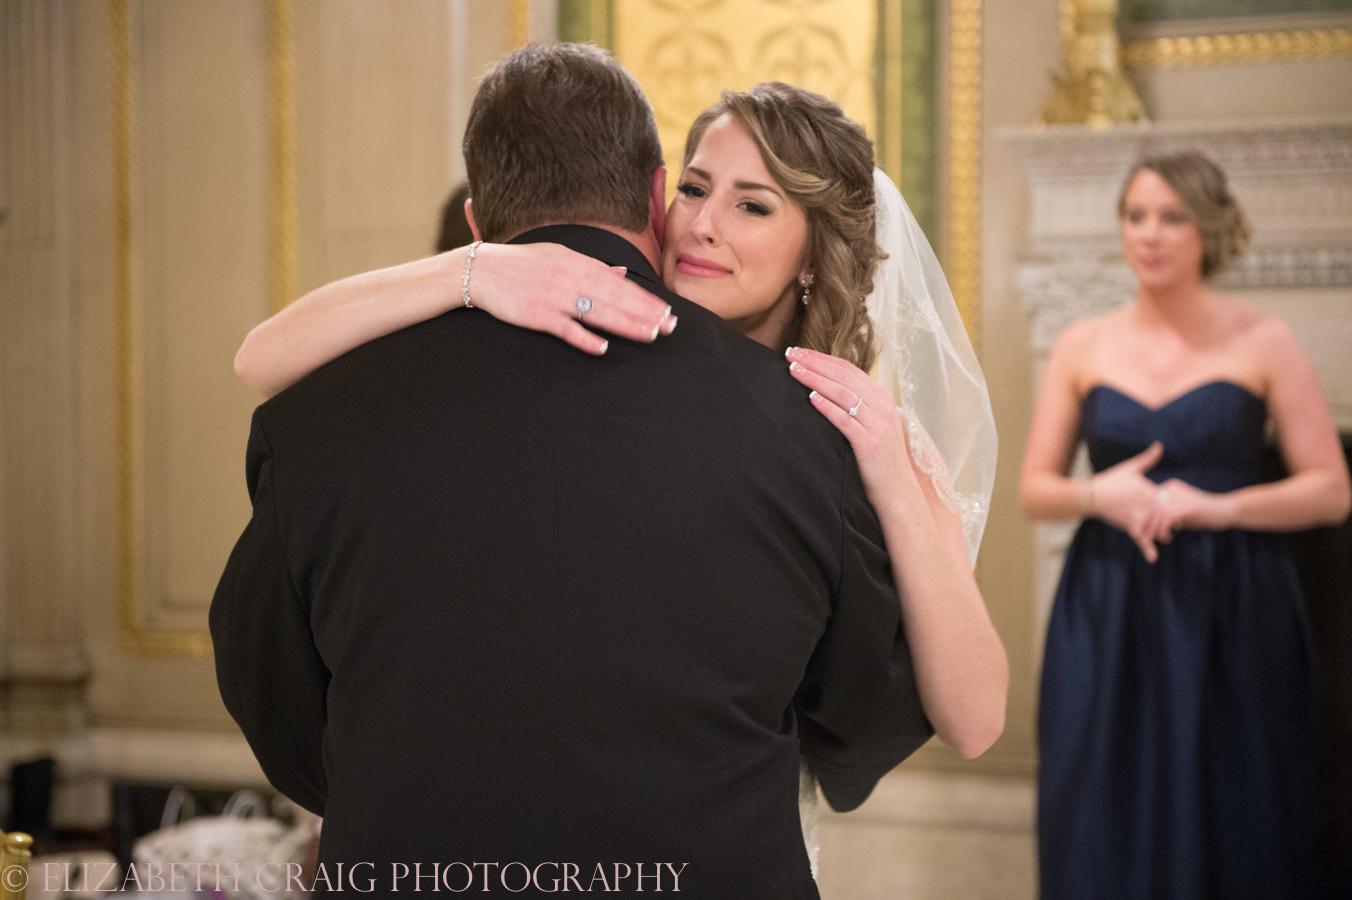 Carnegie Museum of Art Weddings | Elizabeth Craig Photography-0040